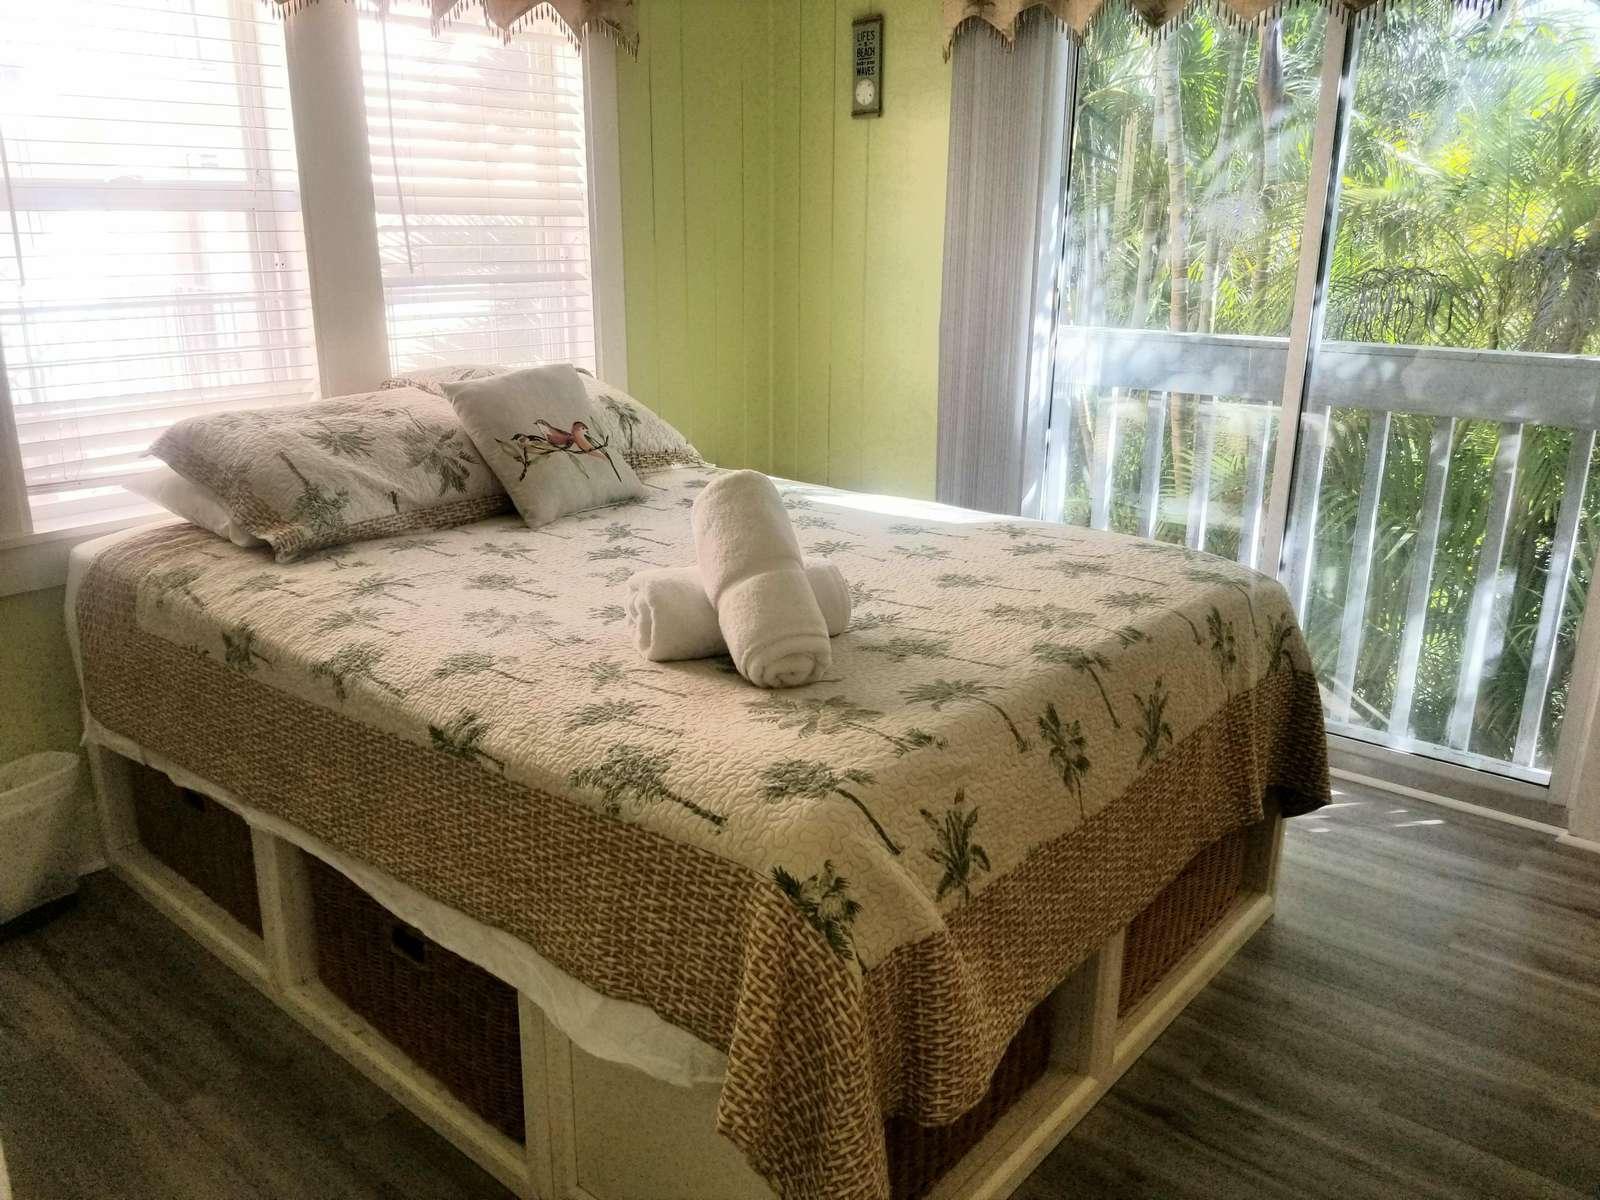 East side bedroom